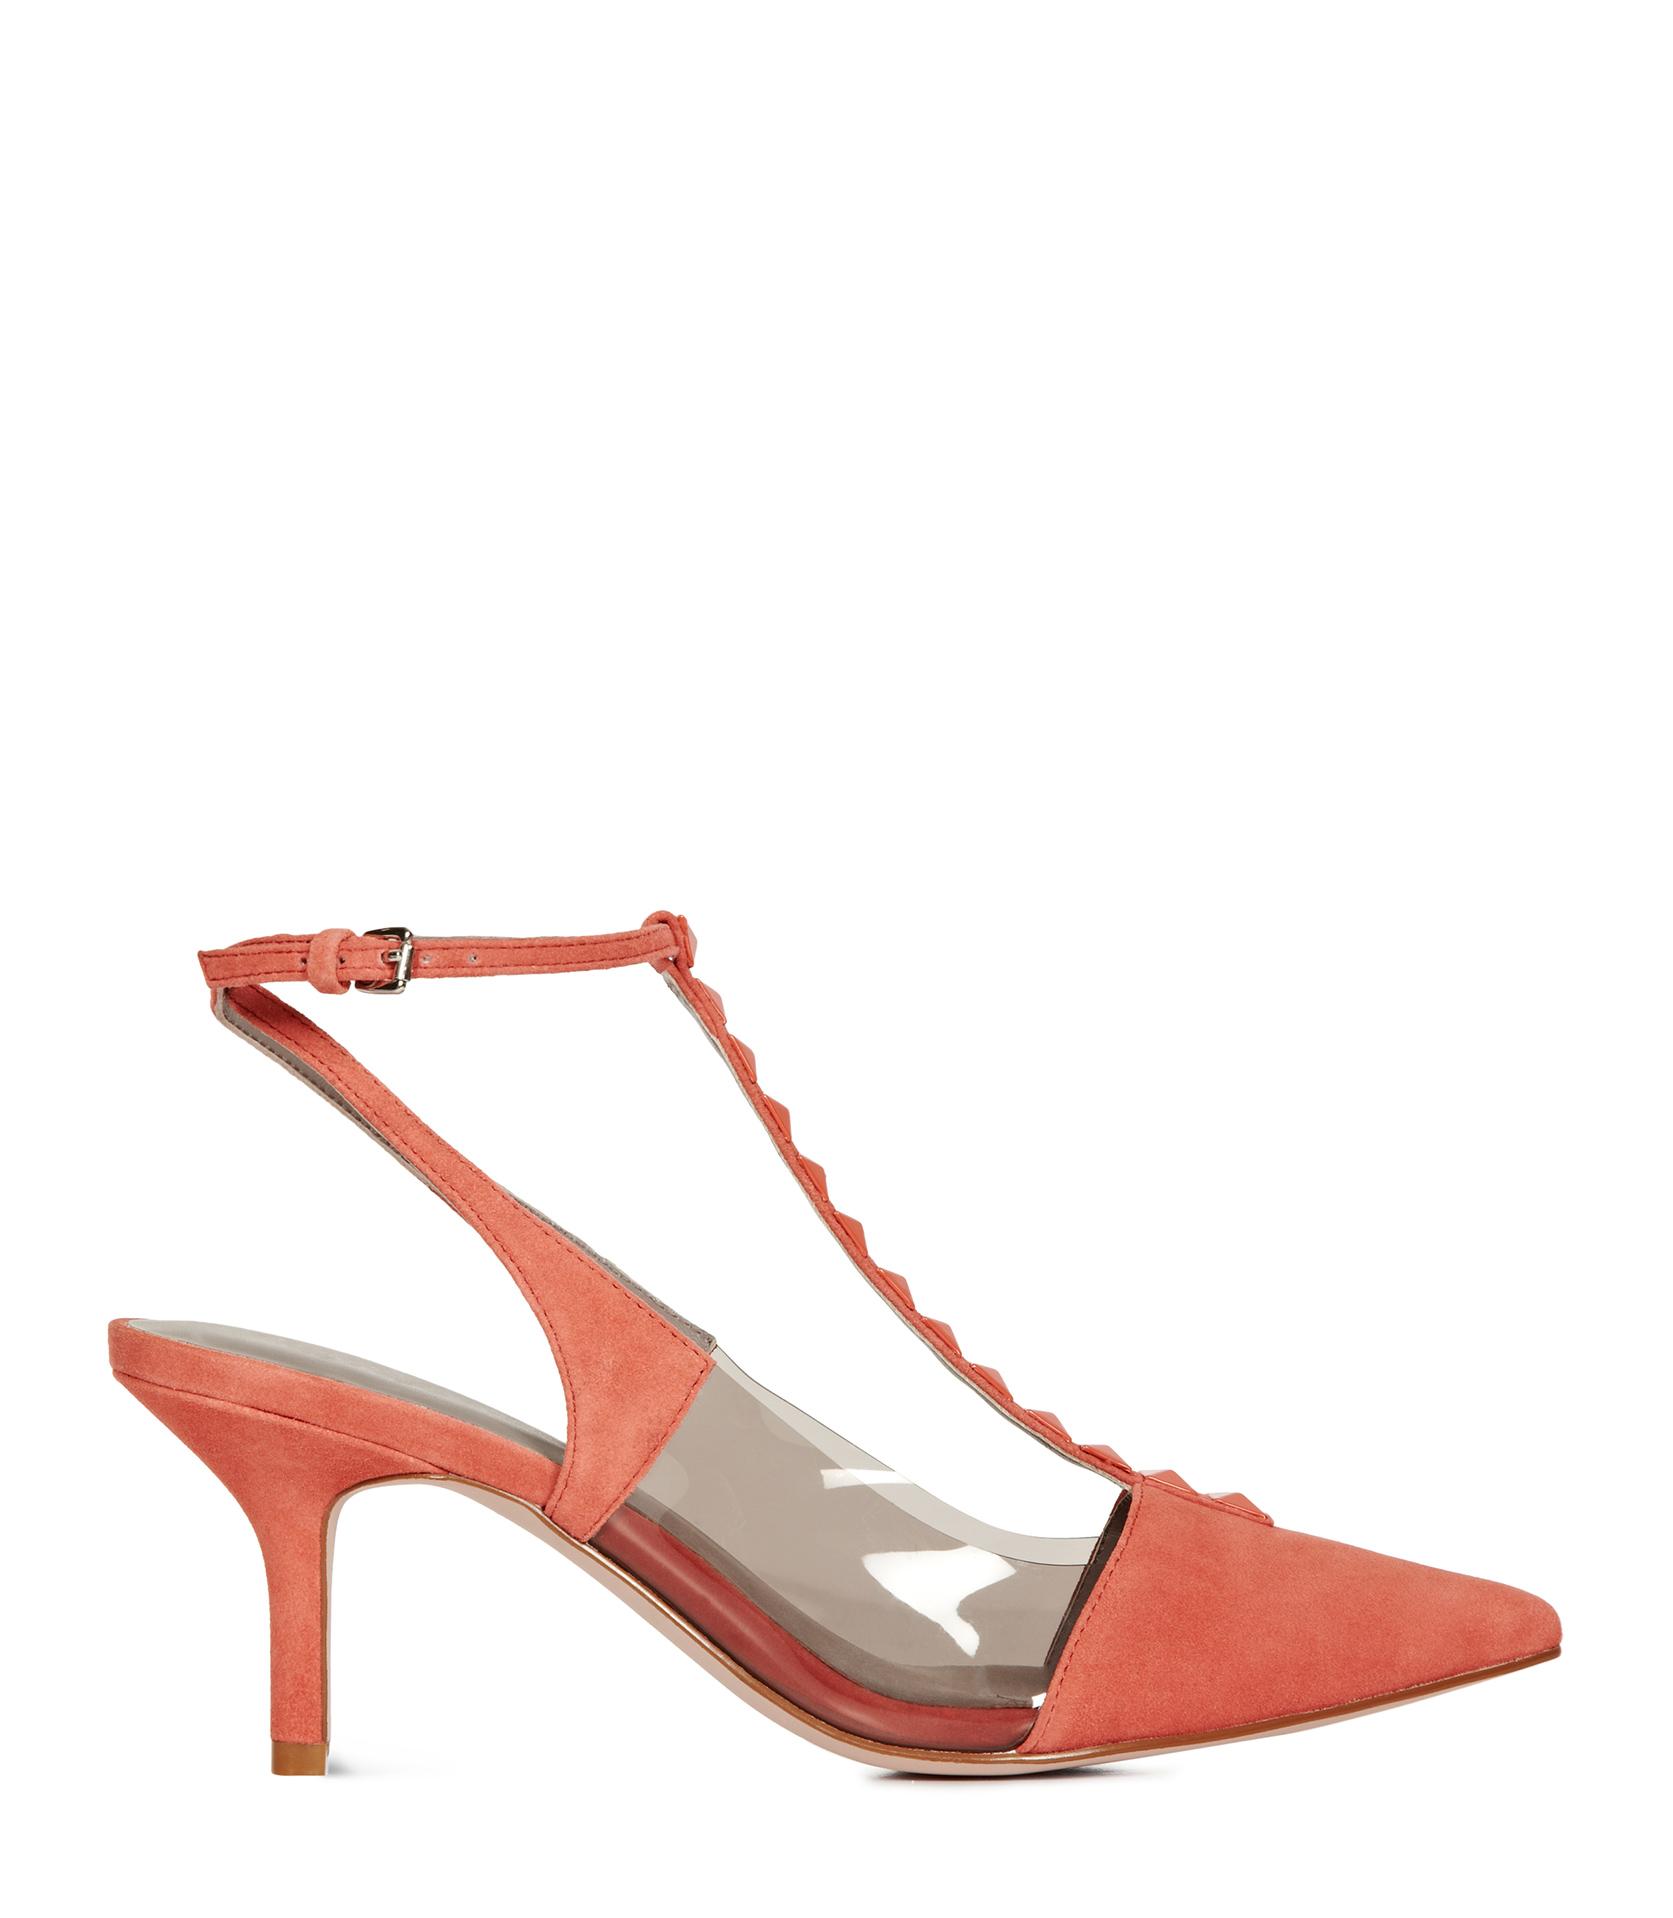 Womens J. Renee Braidy Kitten Heel Pump, Size 7.5 AA - Red